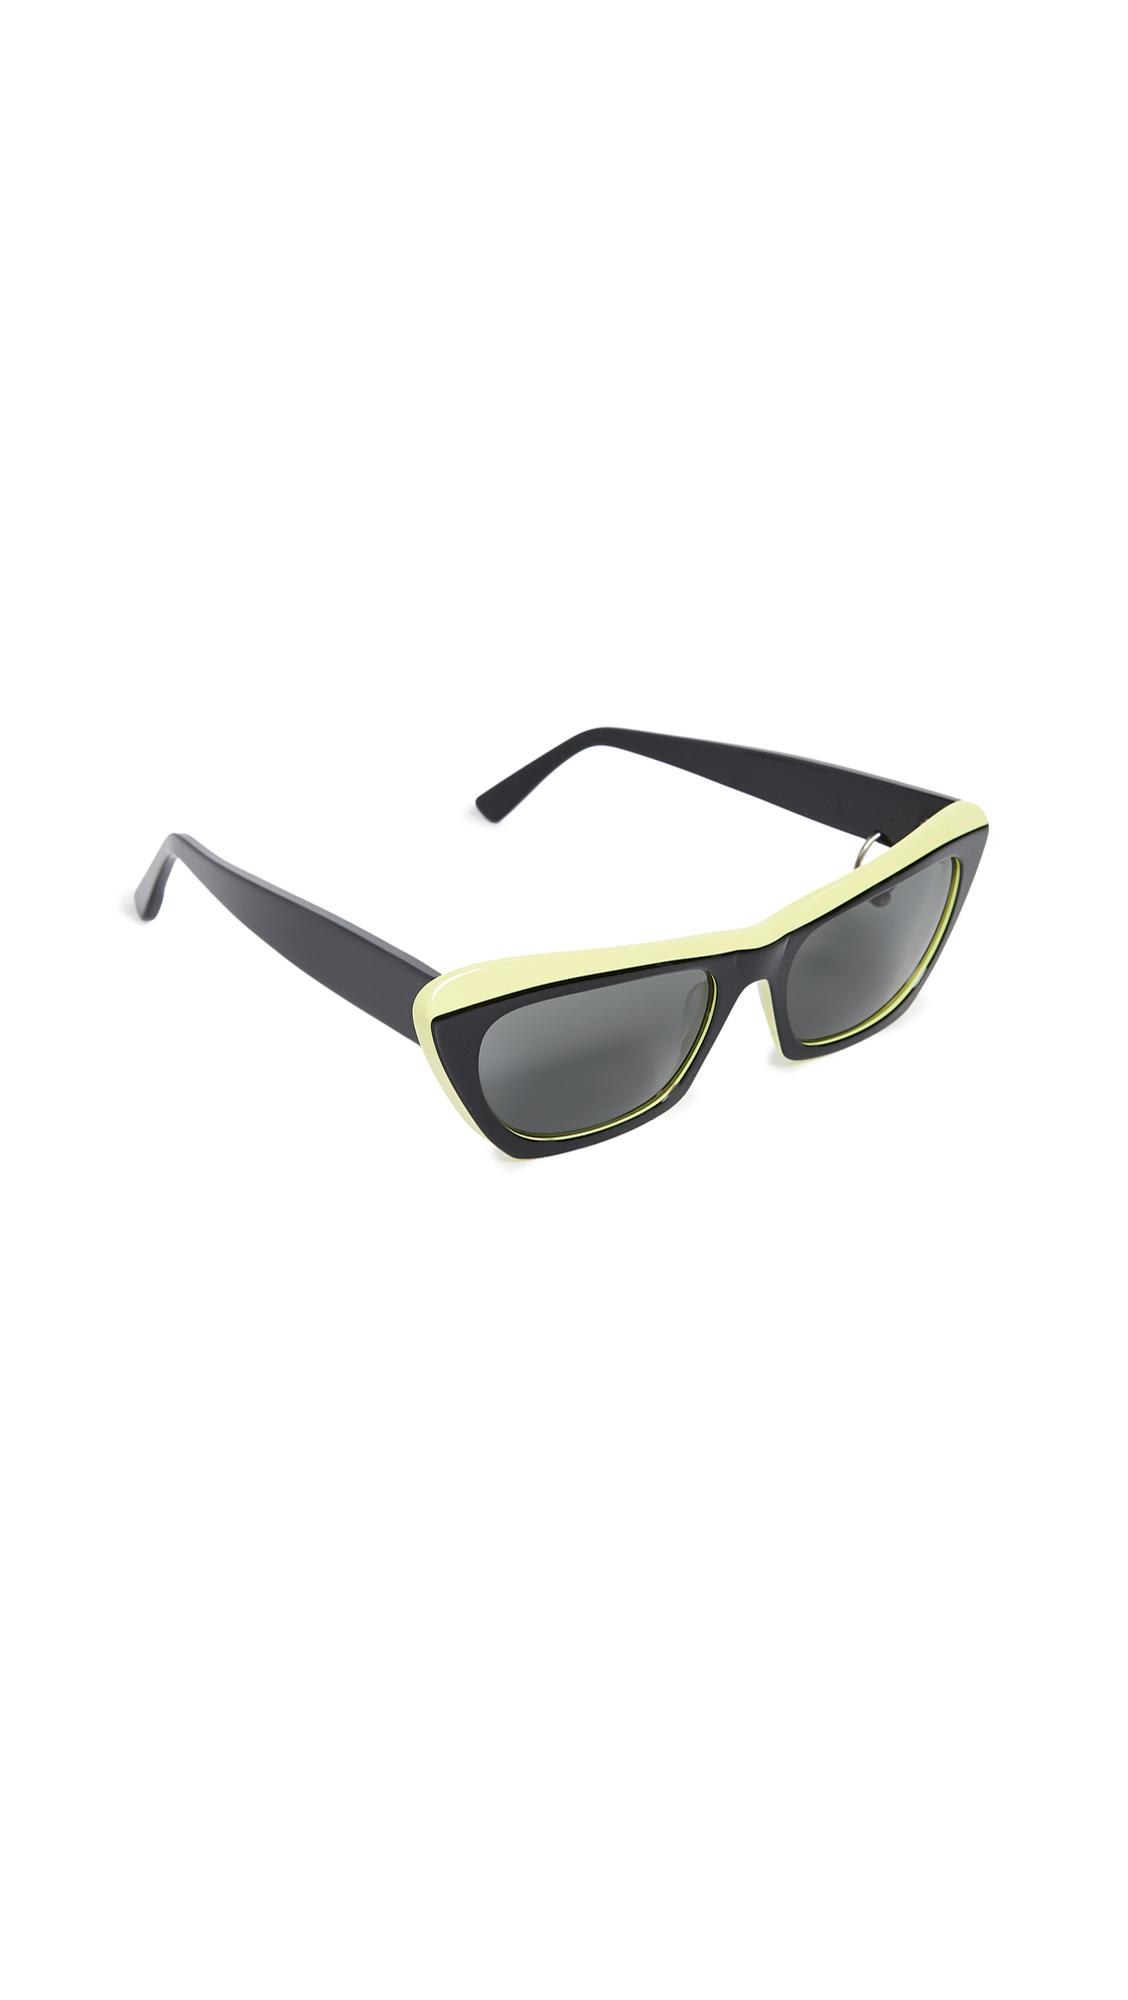 Acne Studios Azalt Sunglasses - Black/Yellow